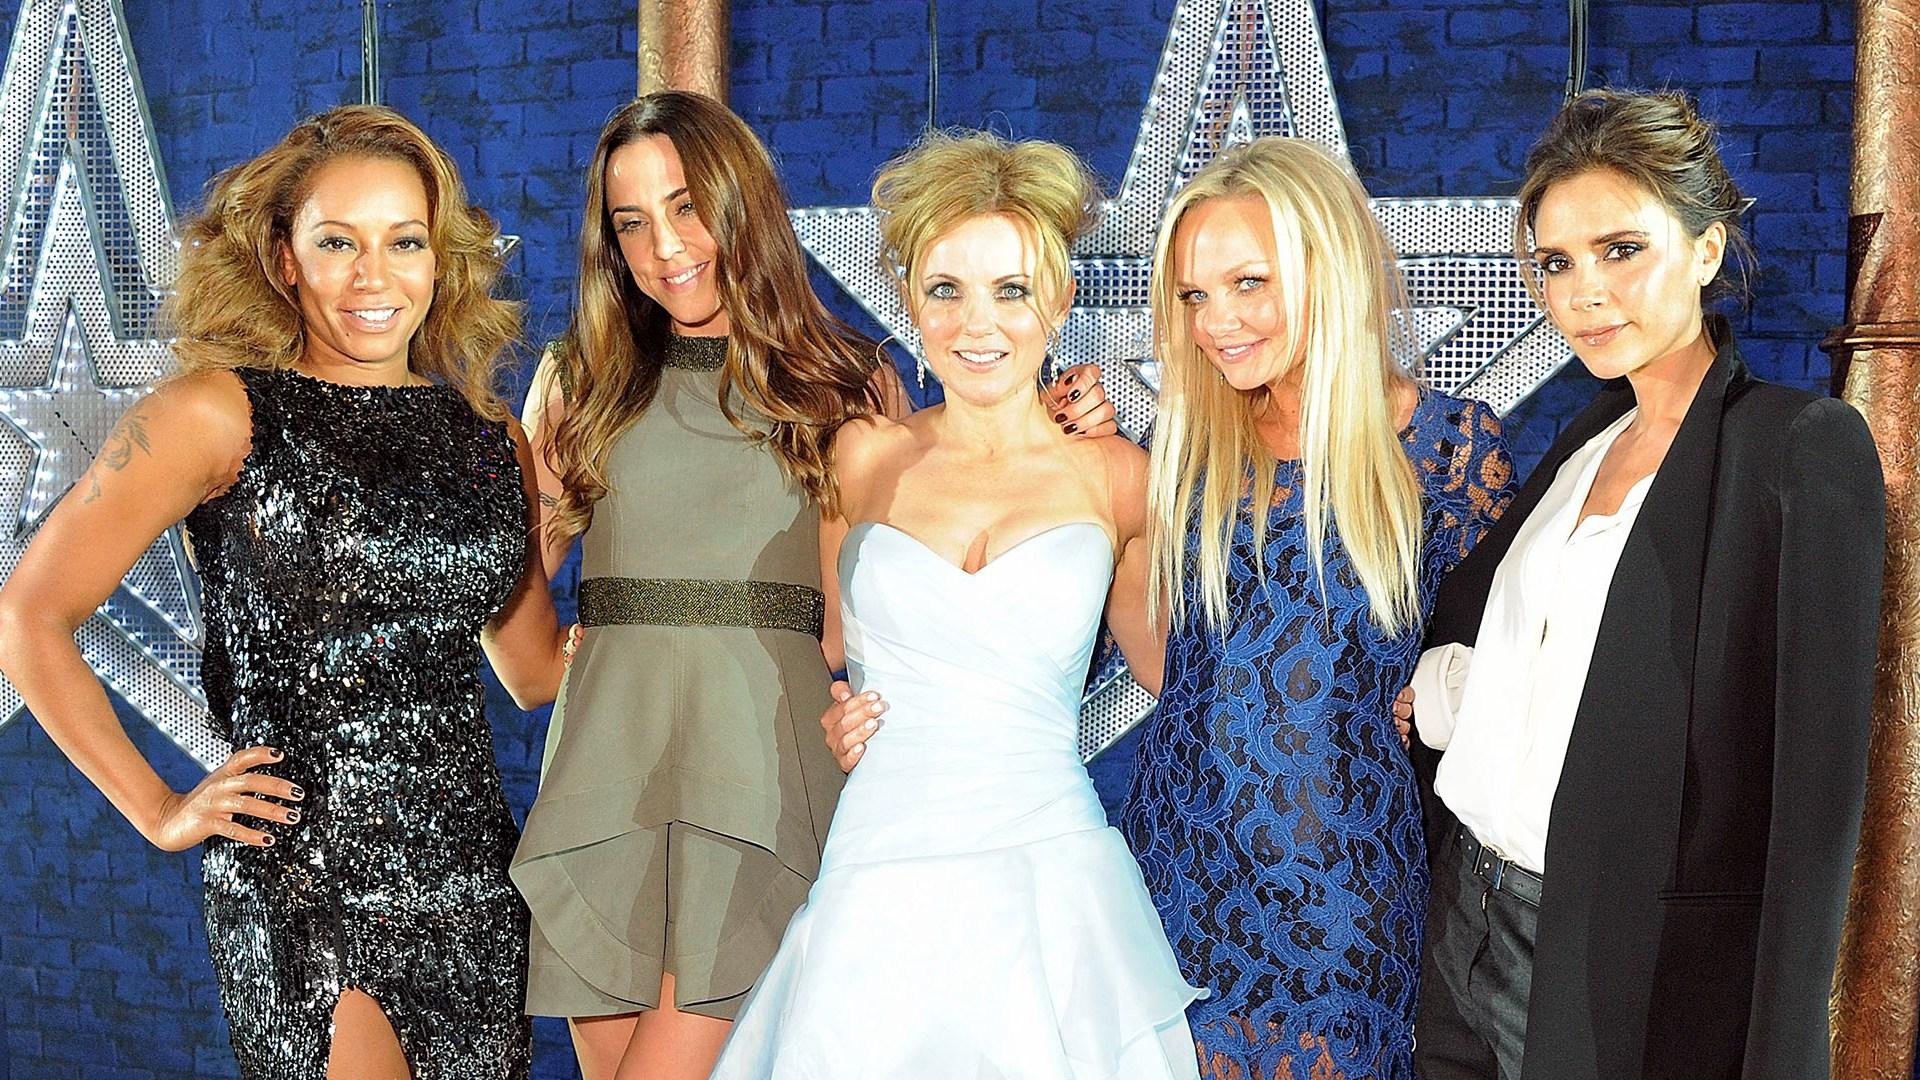 Spice Girls